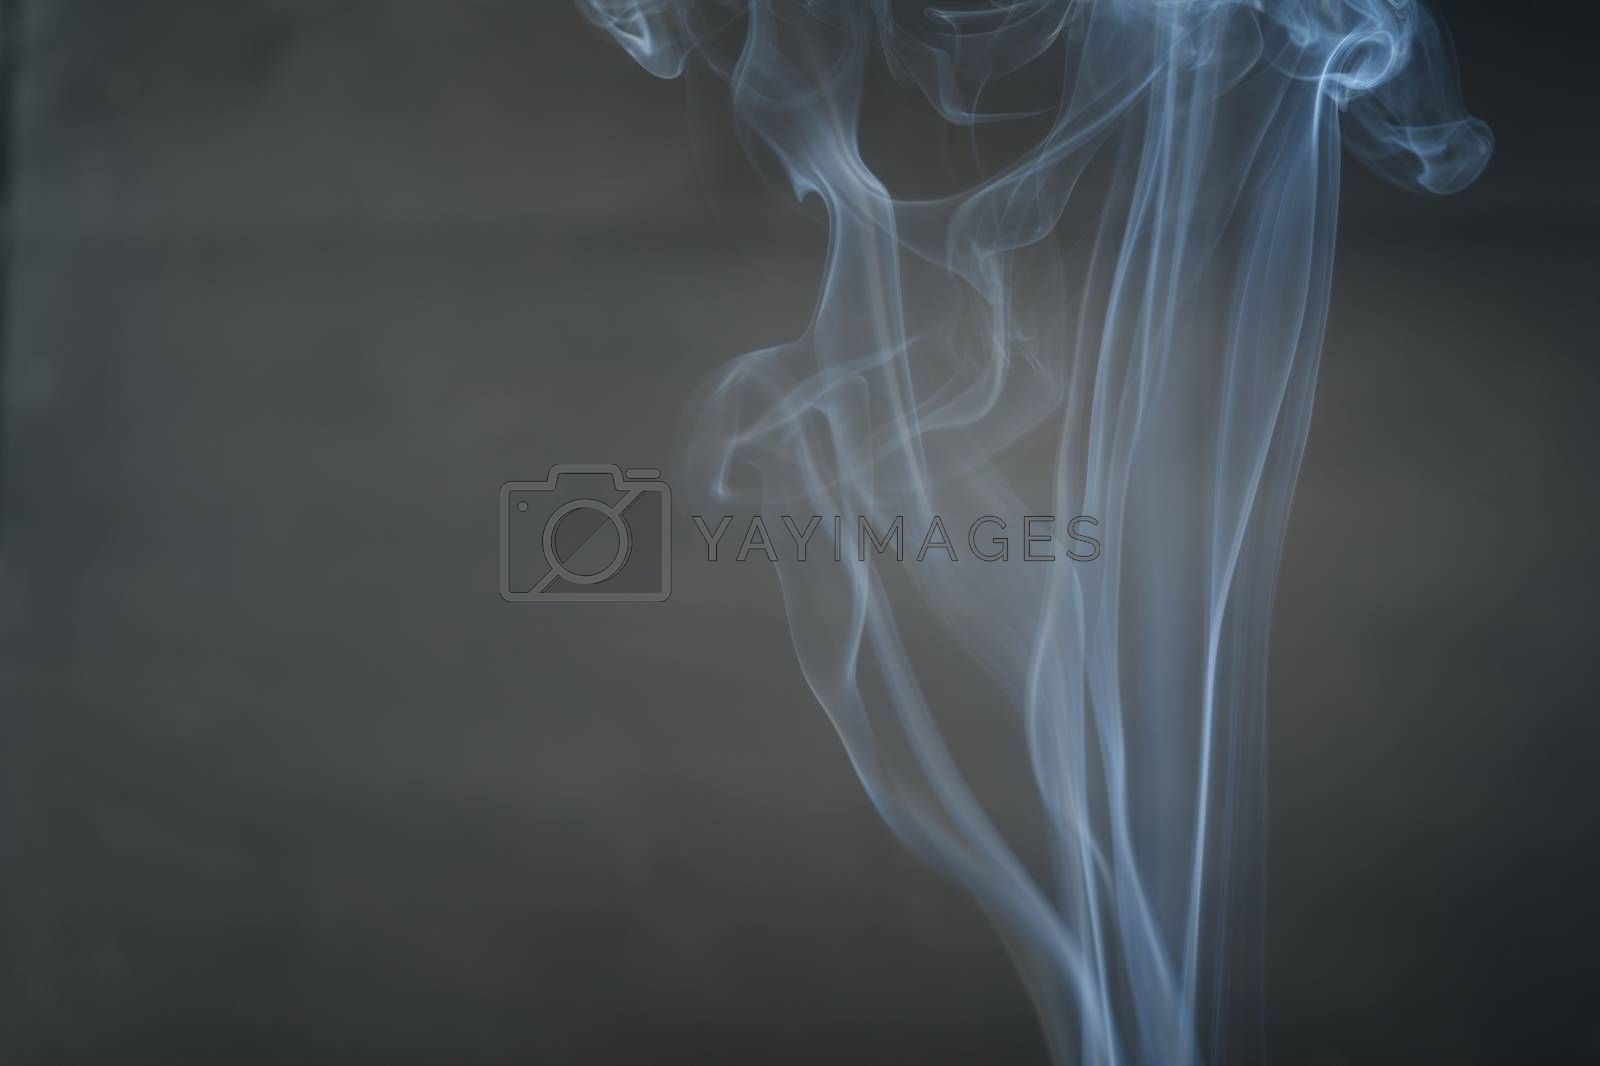 White smoke, curly black background, used as the background image.